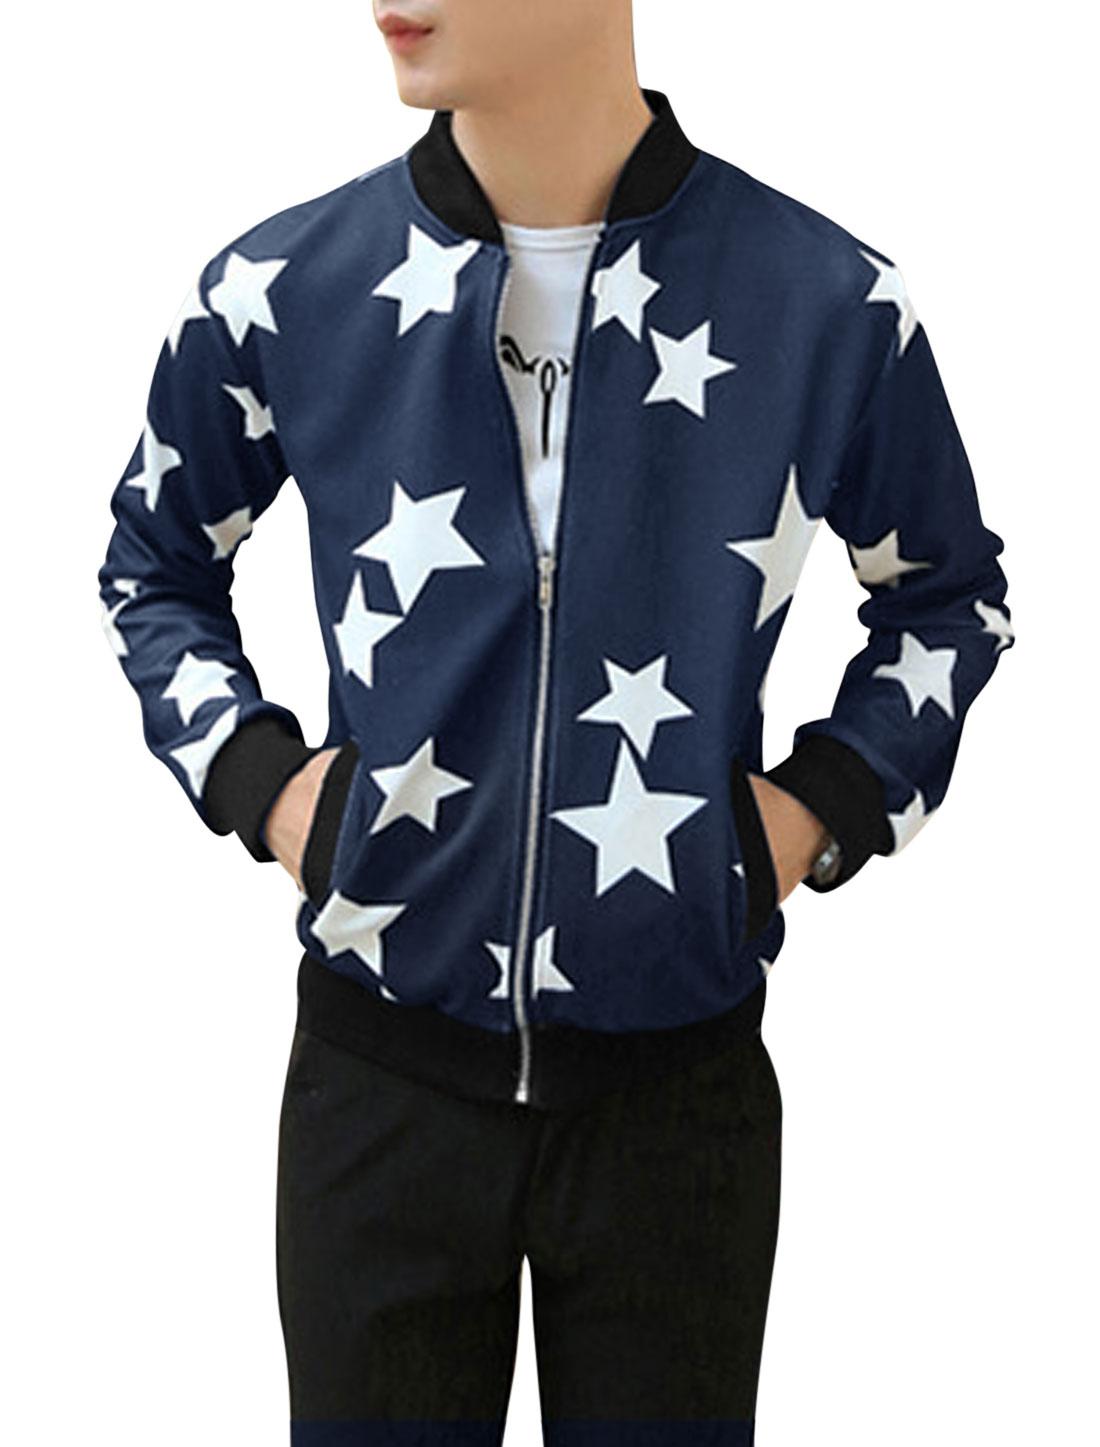 Men Stars Pattern Zip Up Long Sleeve Casual Jacket Navy Blue M